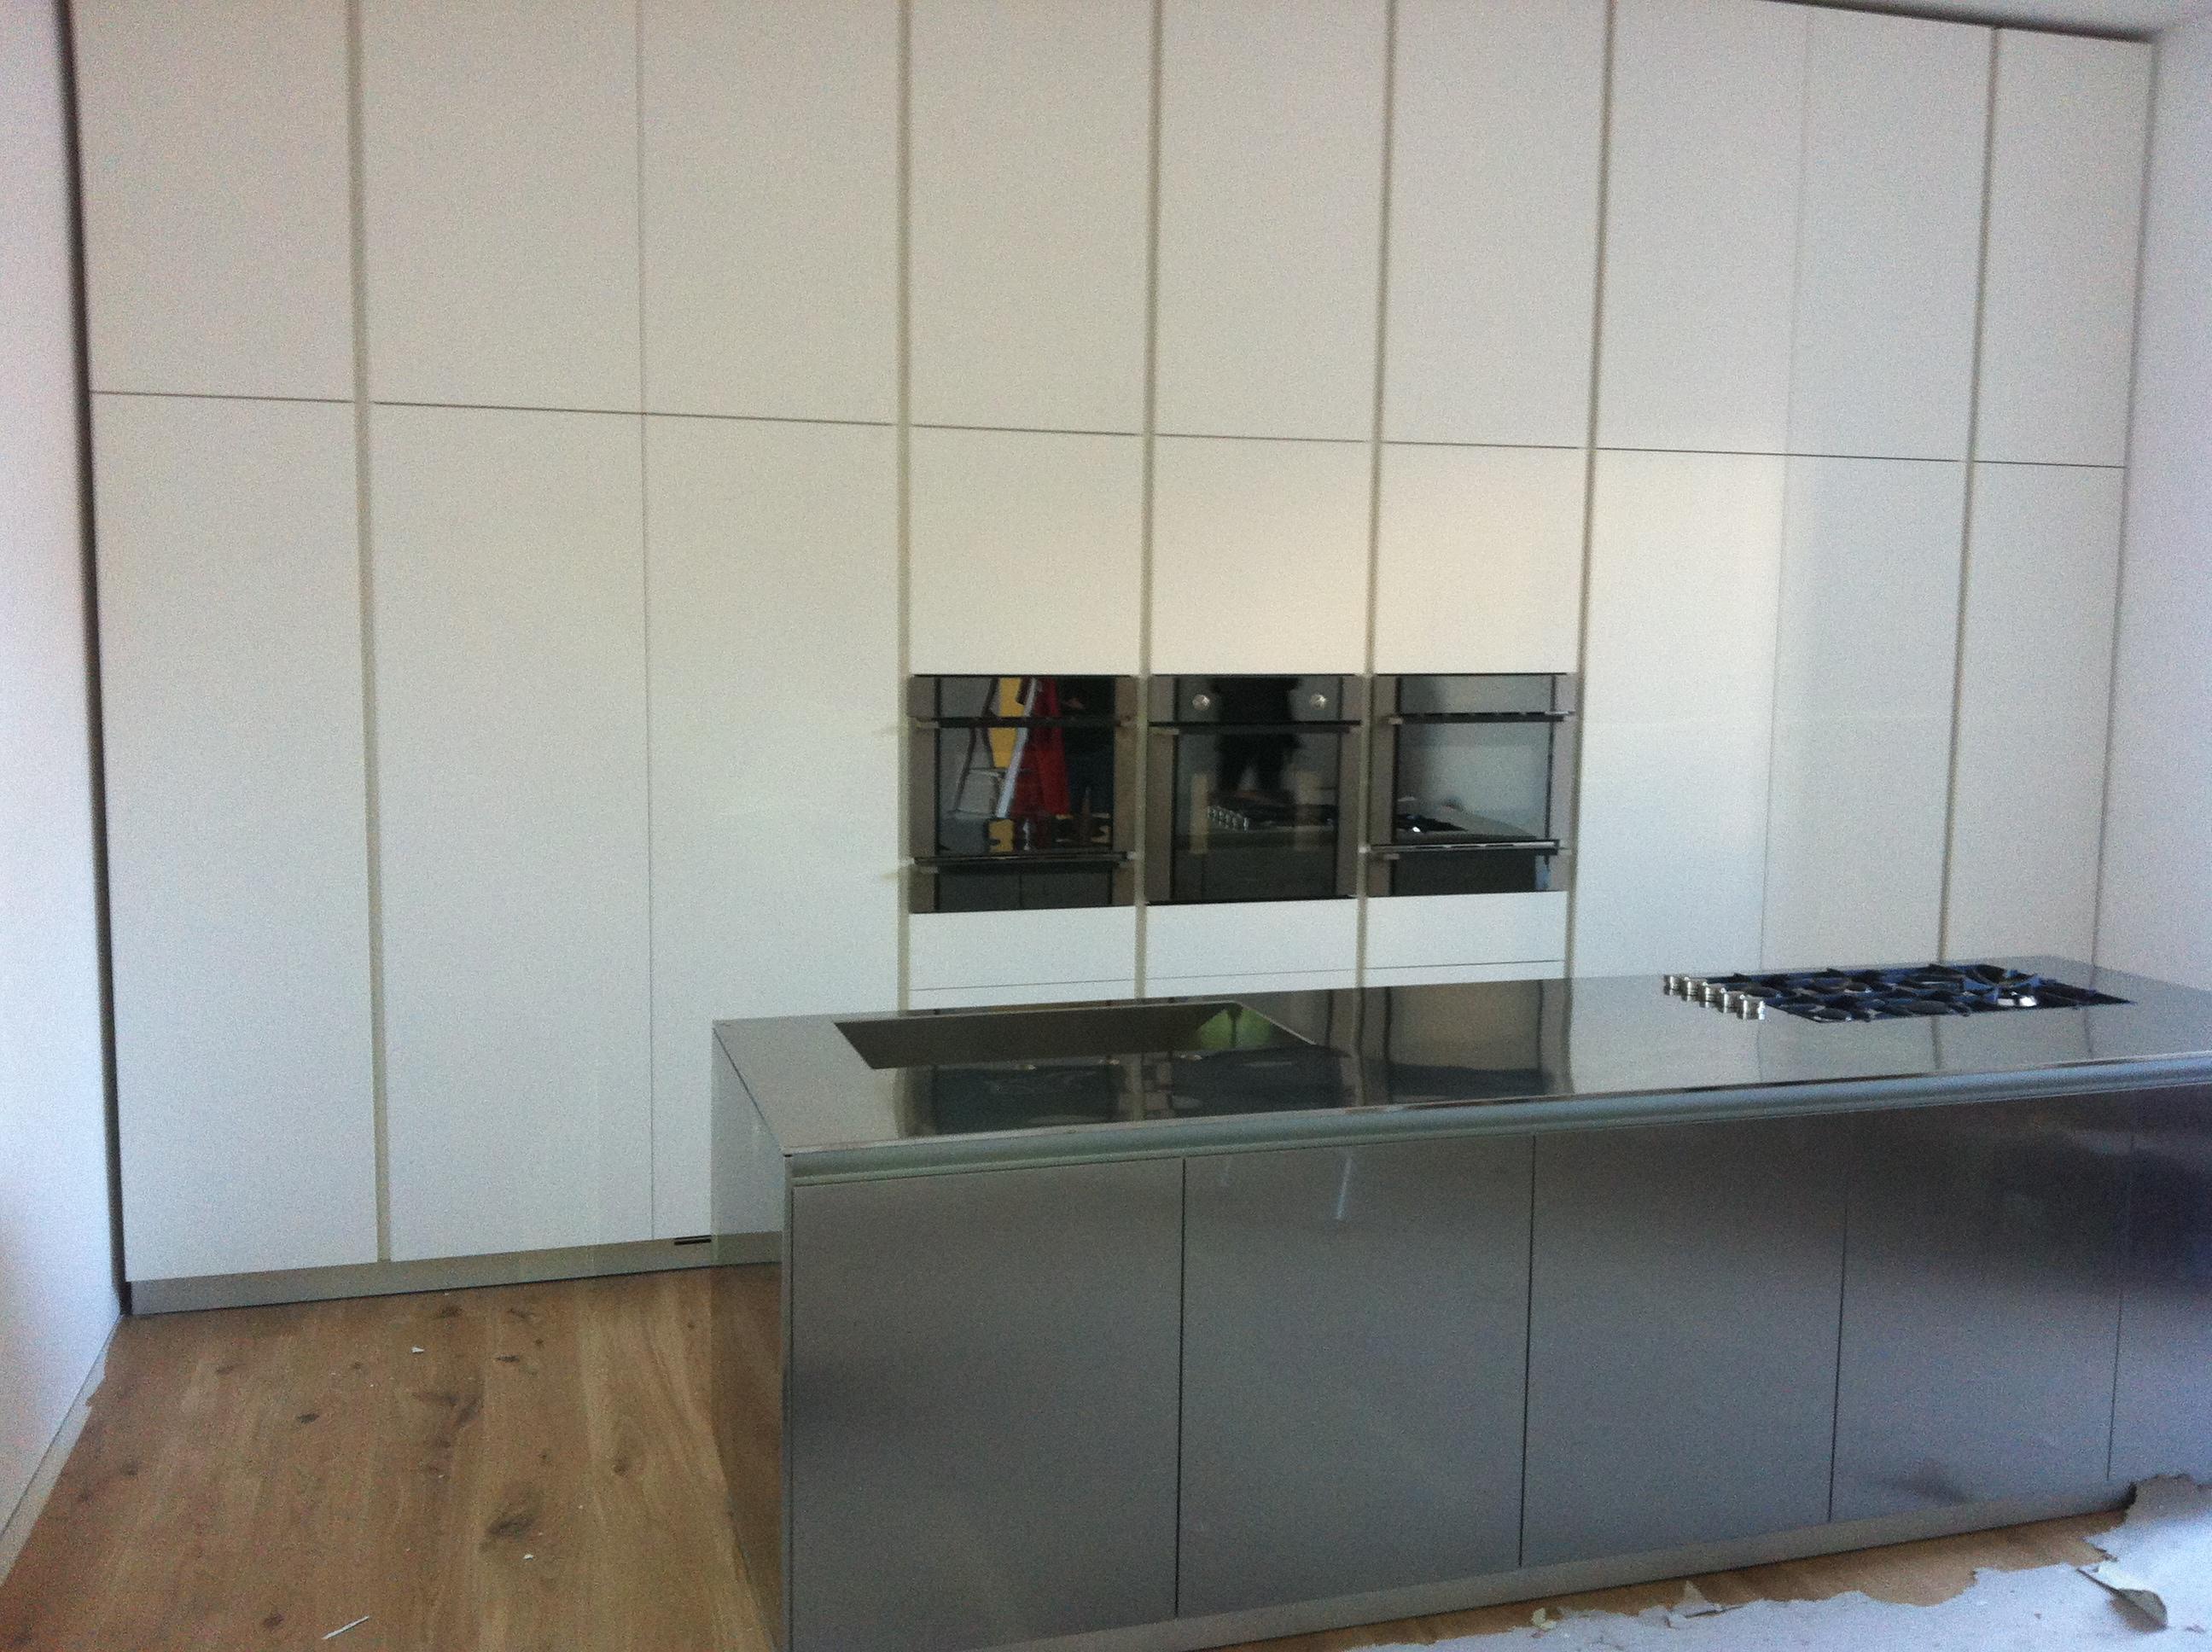 Cucine varenna cucina moderna cucine moderne arredamento for La cucina moderna wikipedia